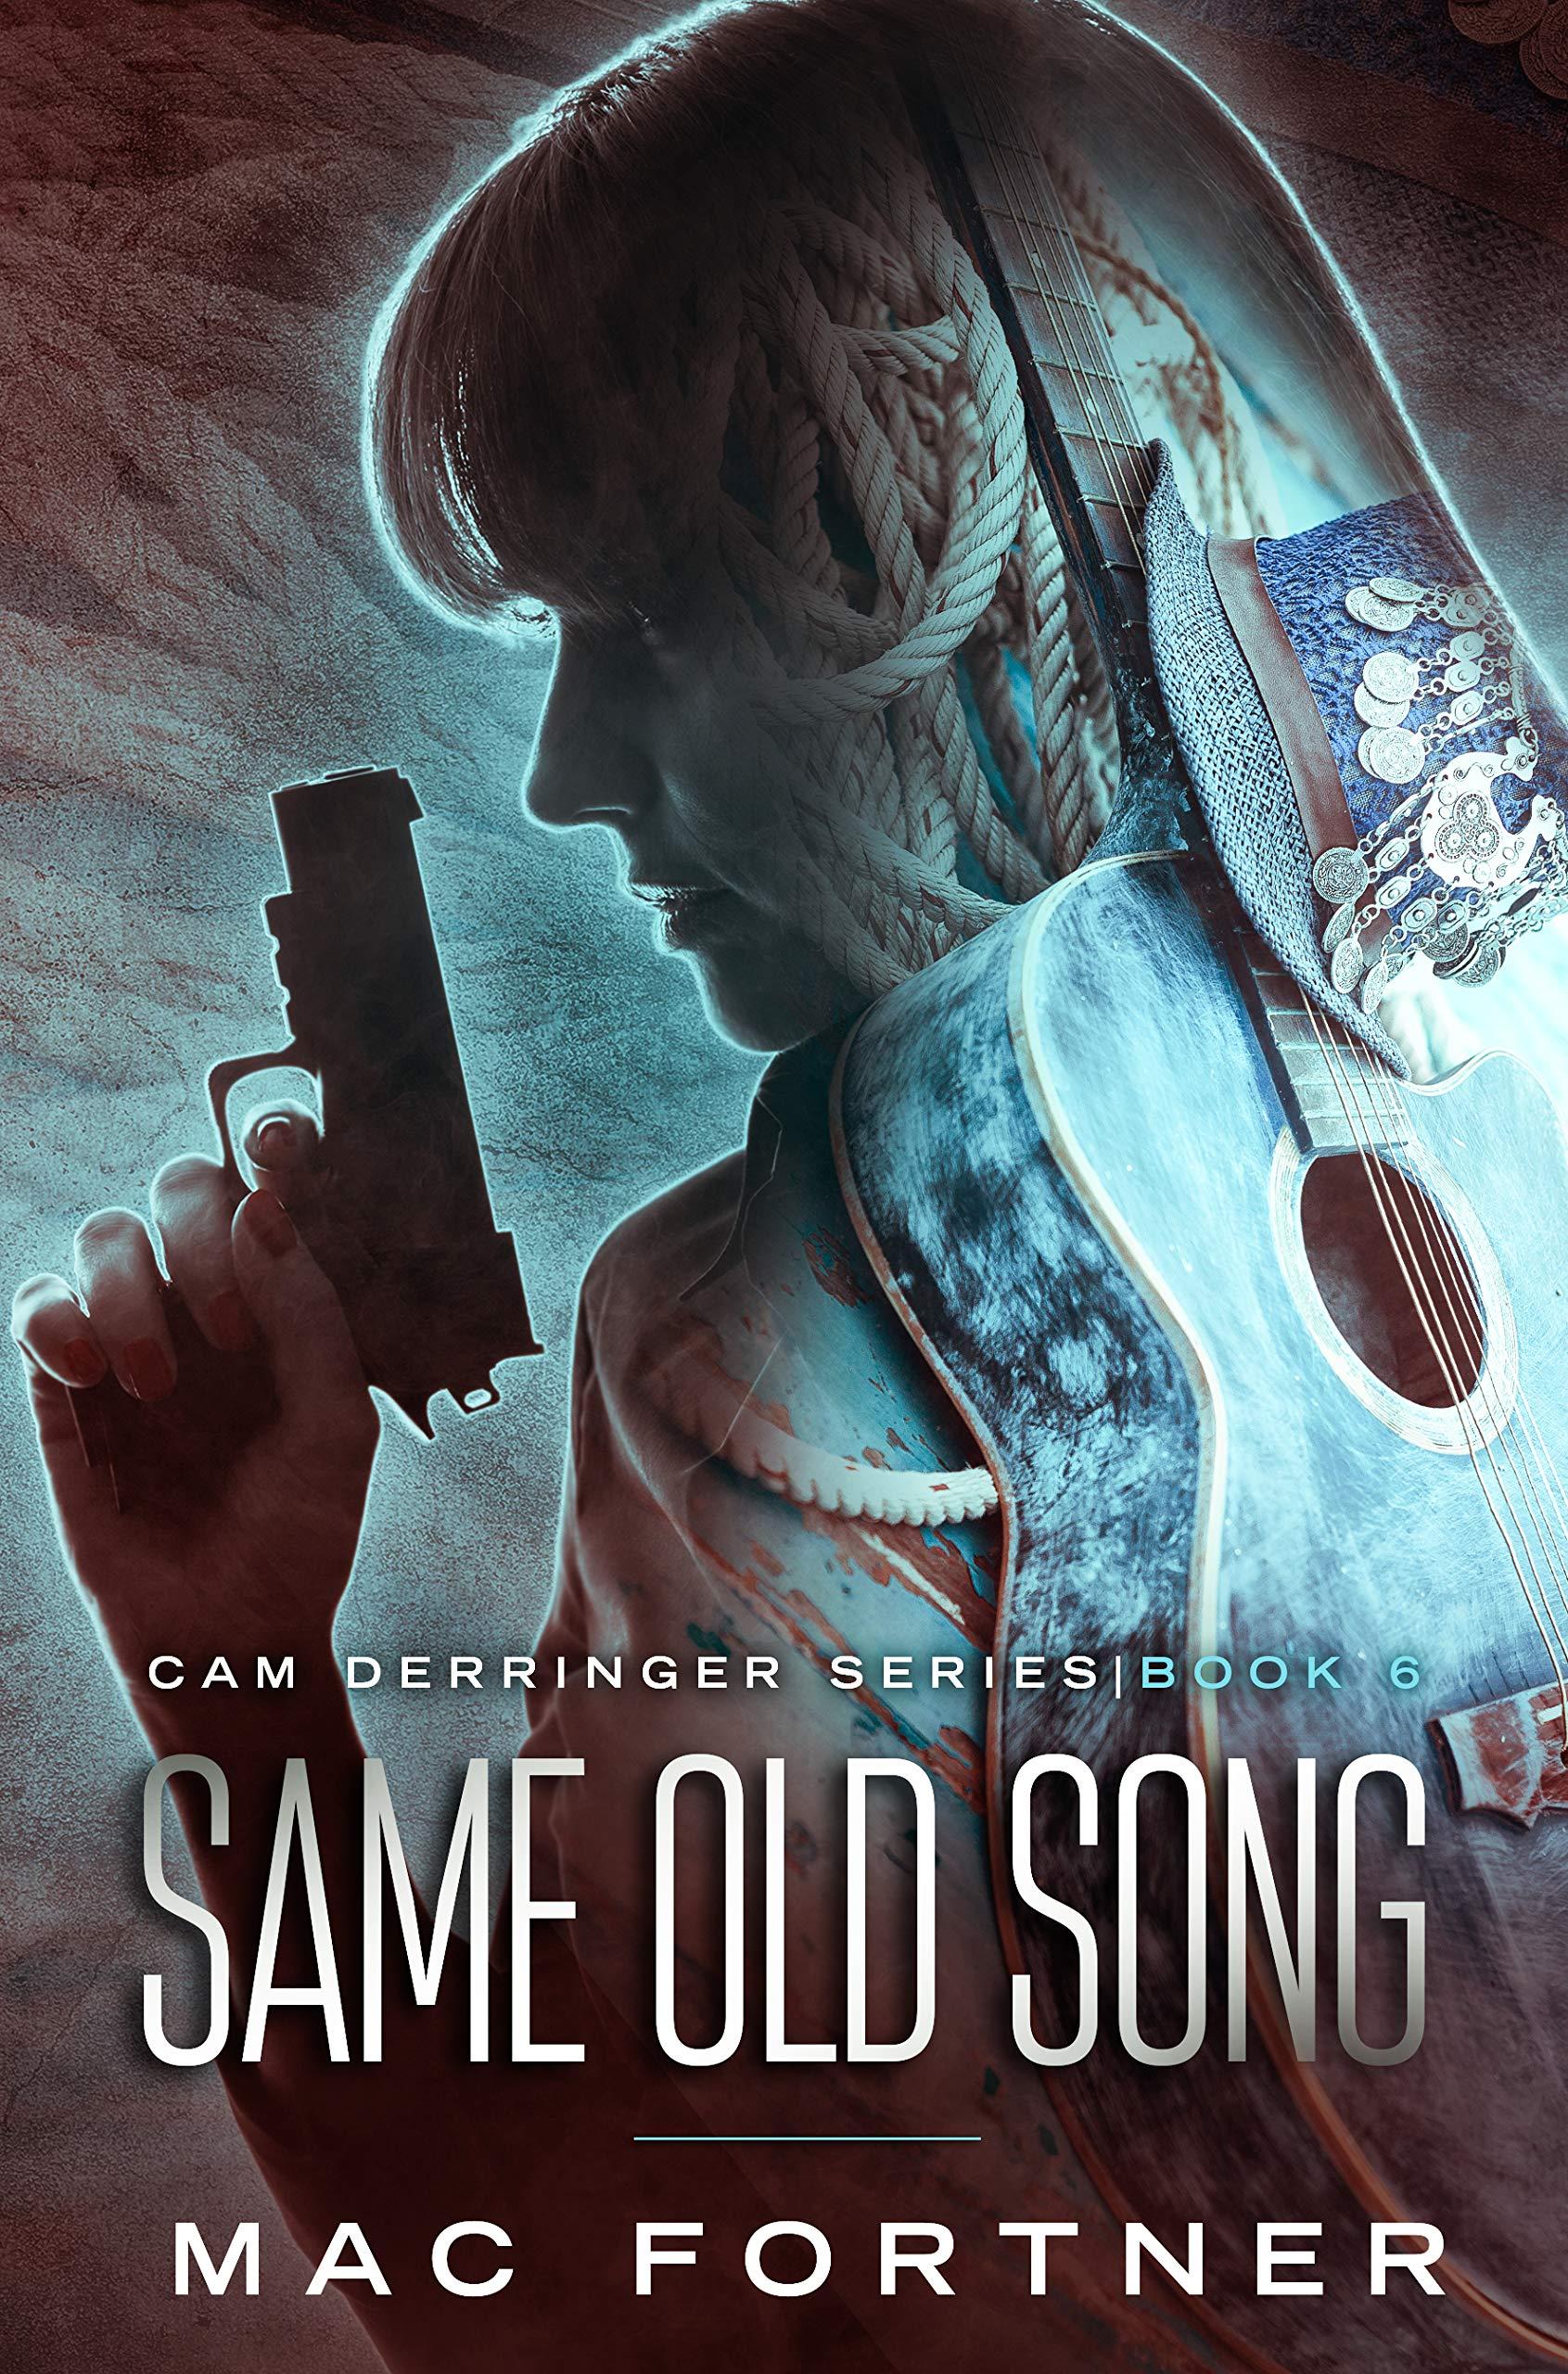 SAME OLD SONG: A Cam Derringer Novel (Tropical Adventure Series Book 6)